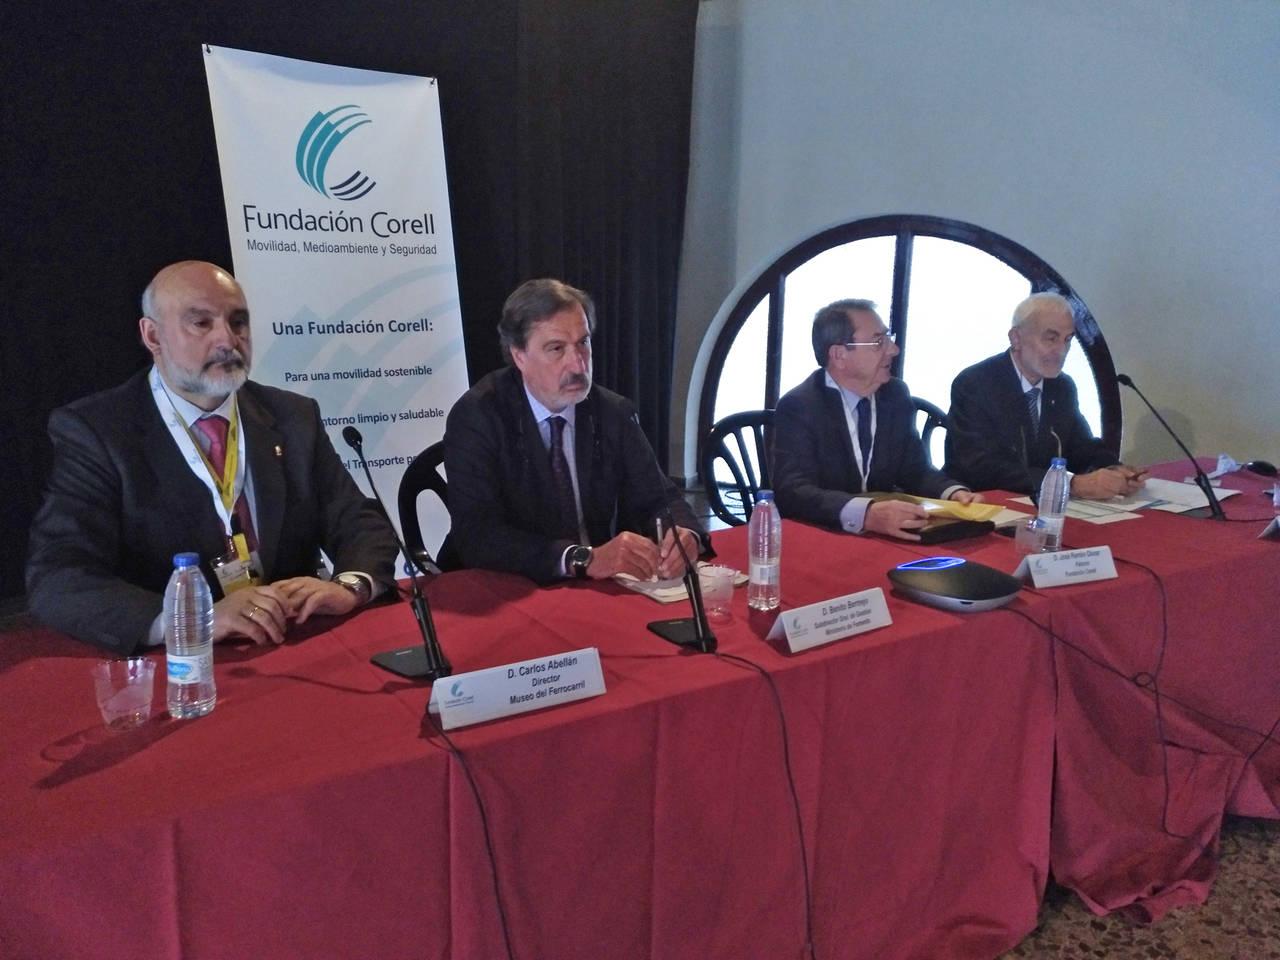 Fundación Corell expone el transporte intermodal